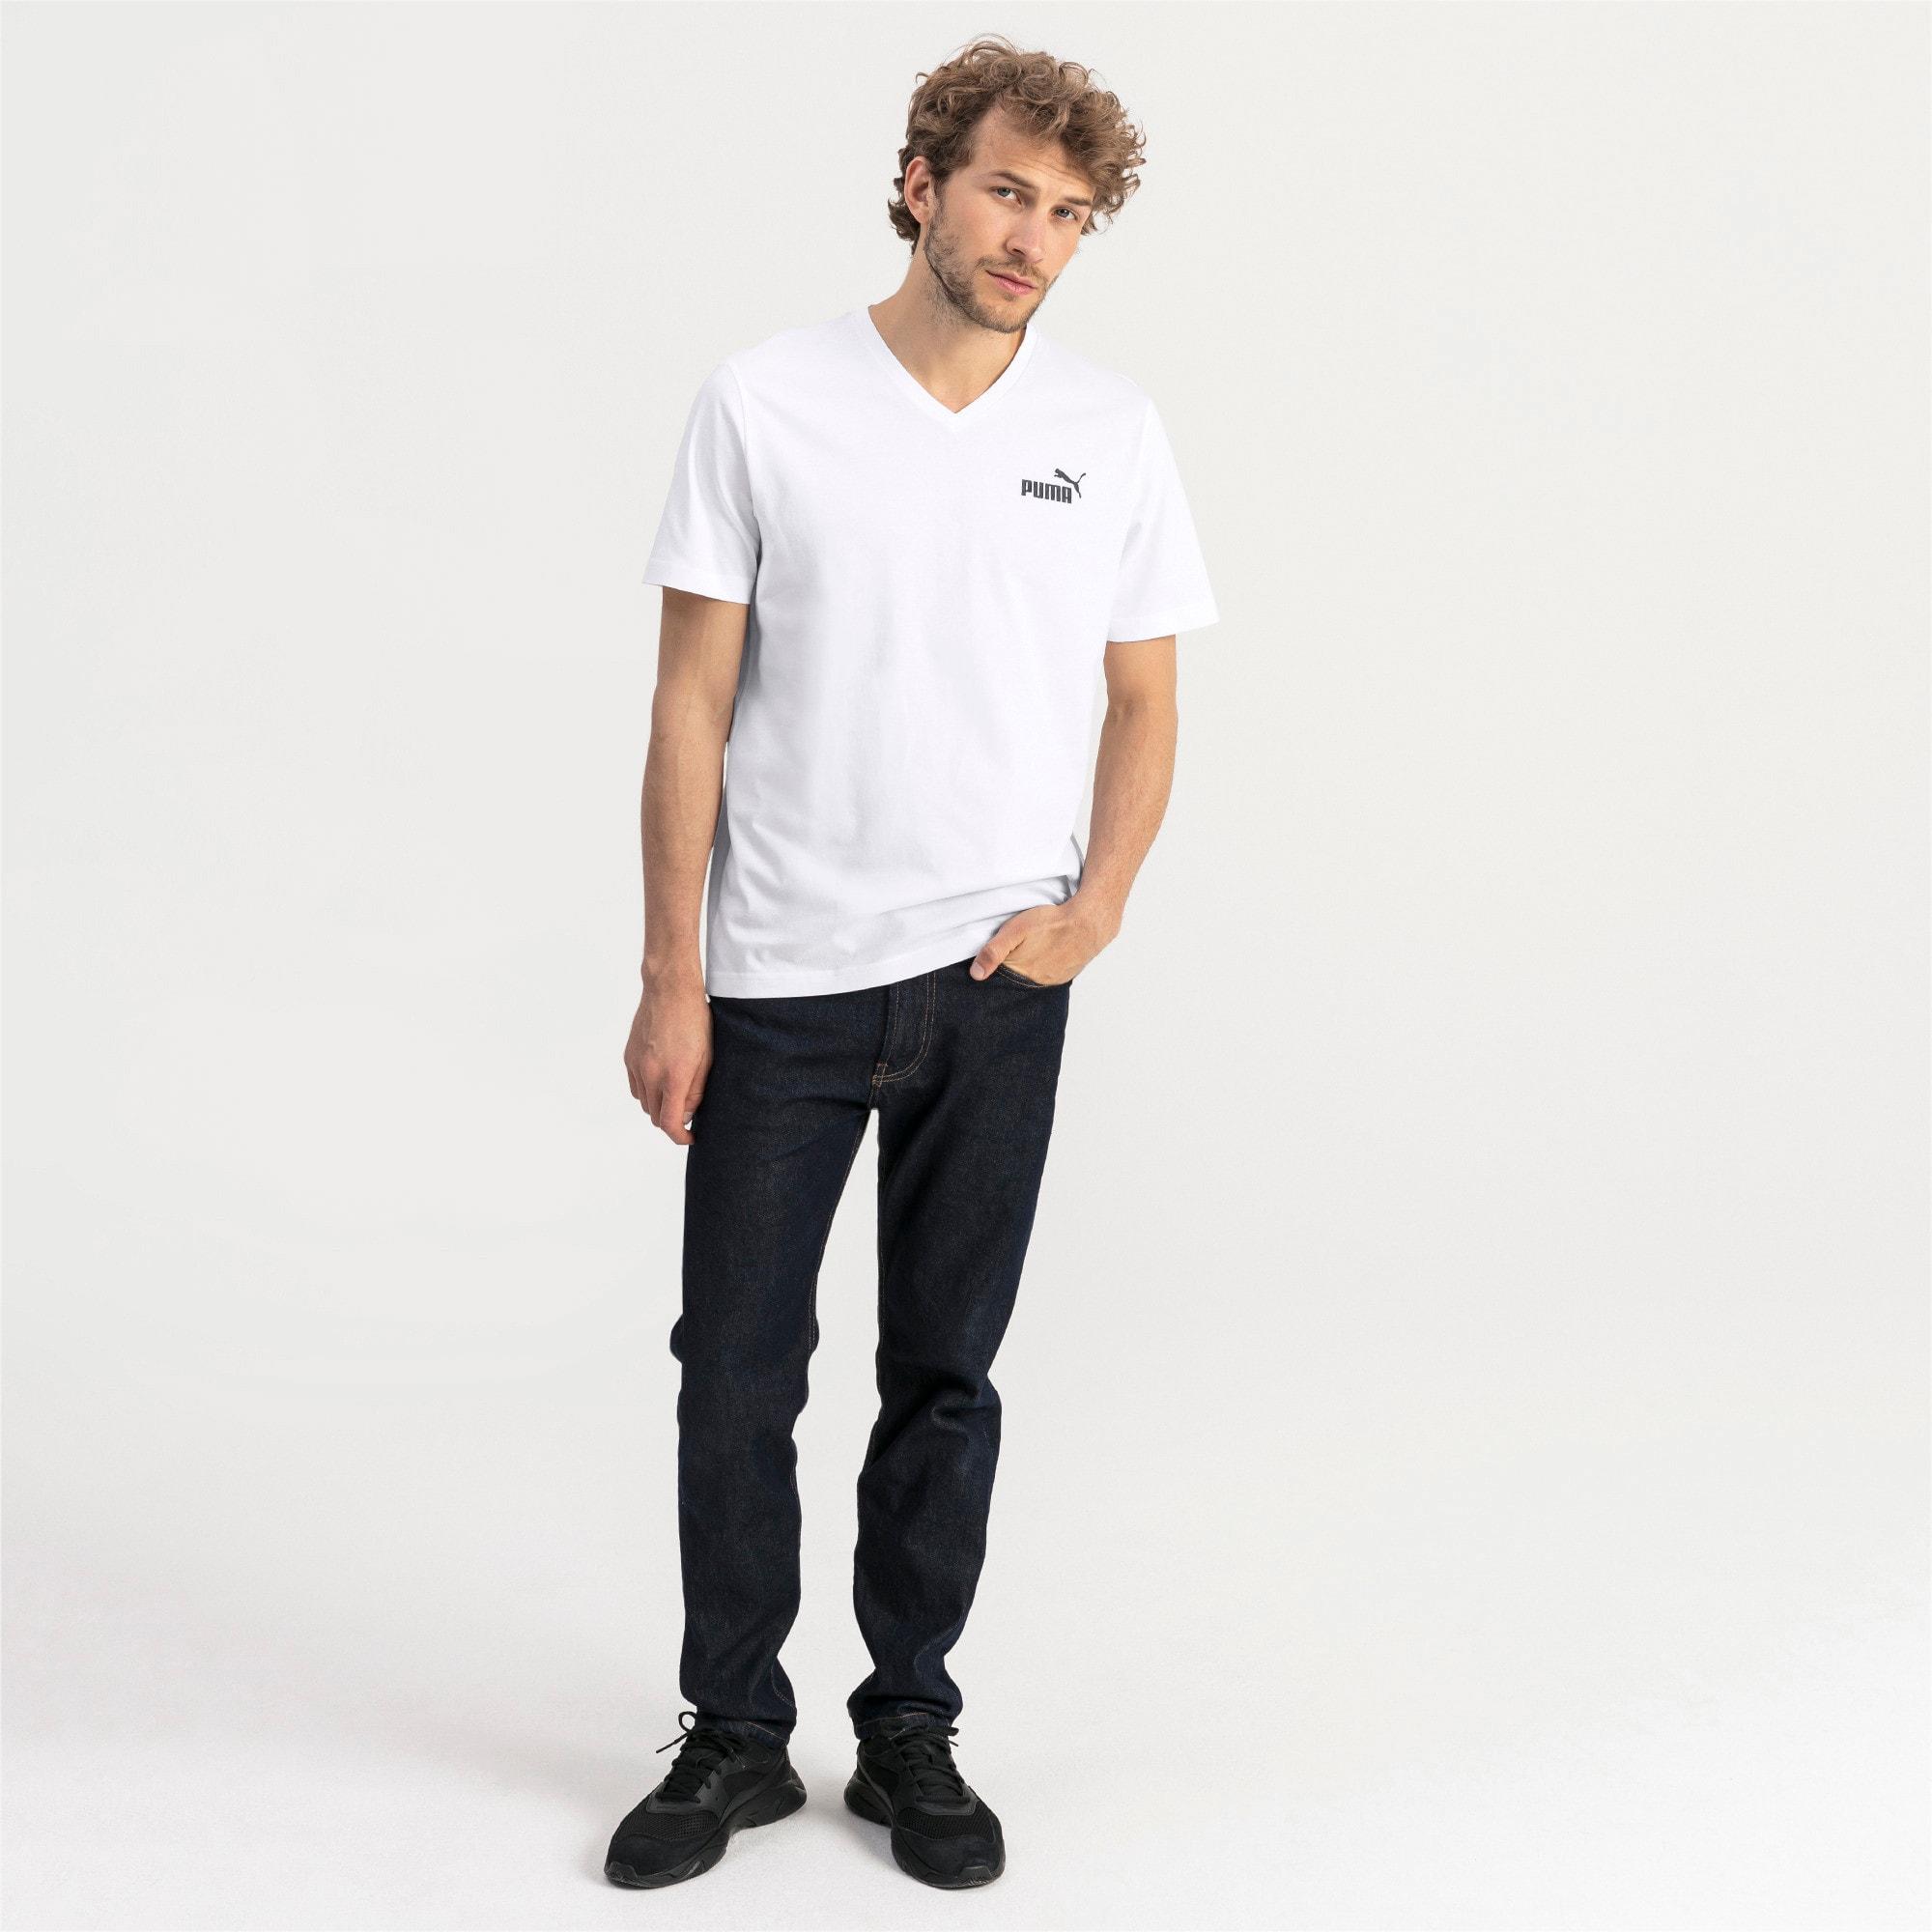 Thumbnail 3 of T-shirt con scollo a V Essentials uomo, Puma White, medium